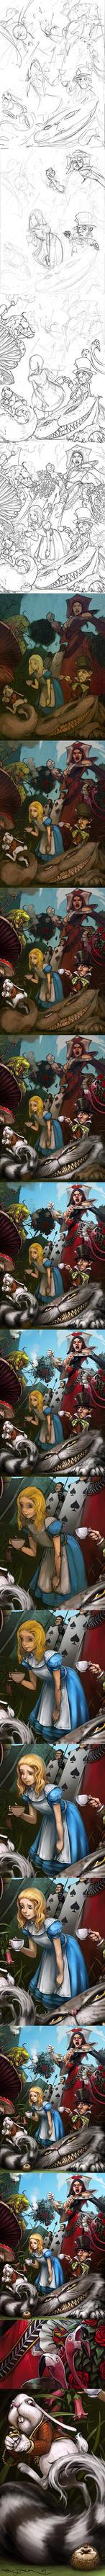 Alice in Wonderland Process by Mr--Jack